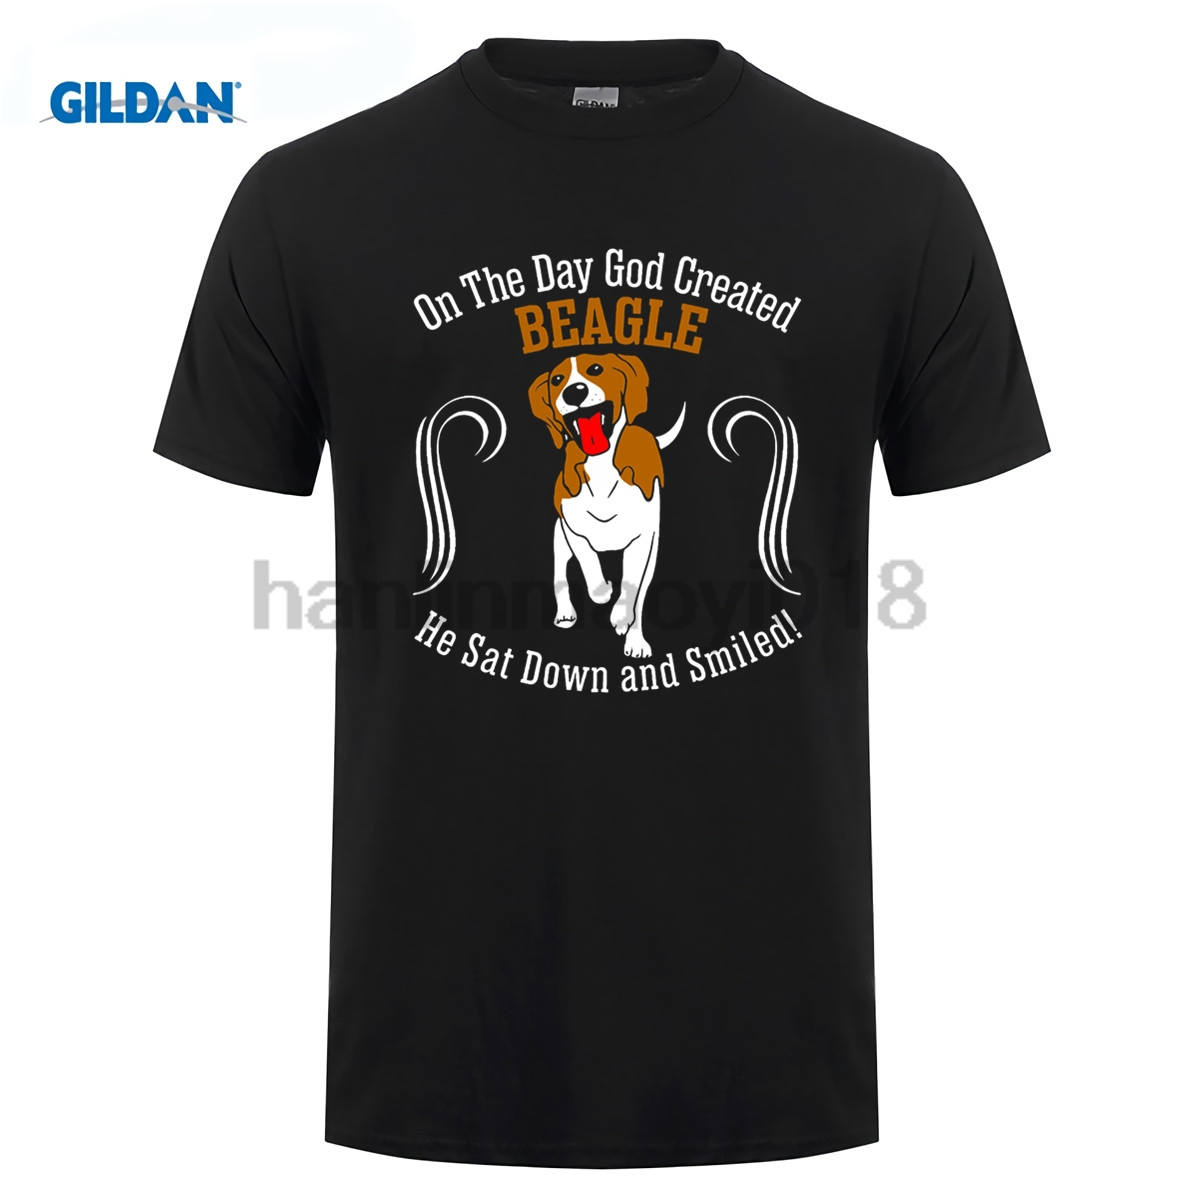 GILDAN God Created Beagle Dog Sat Down Smiled T-Shirt